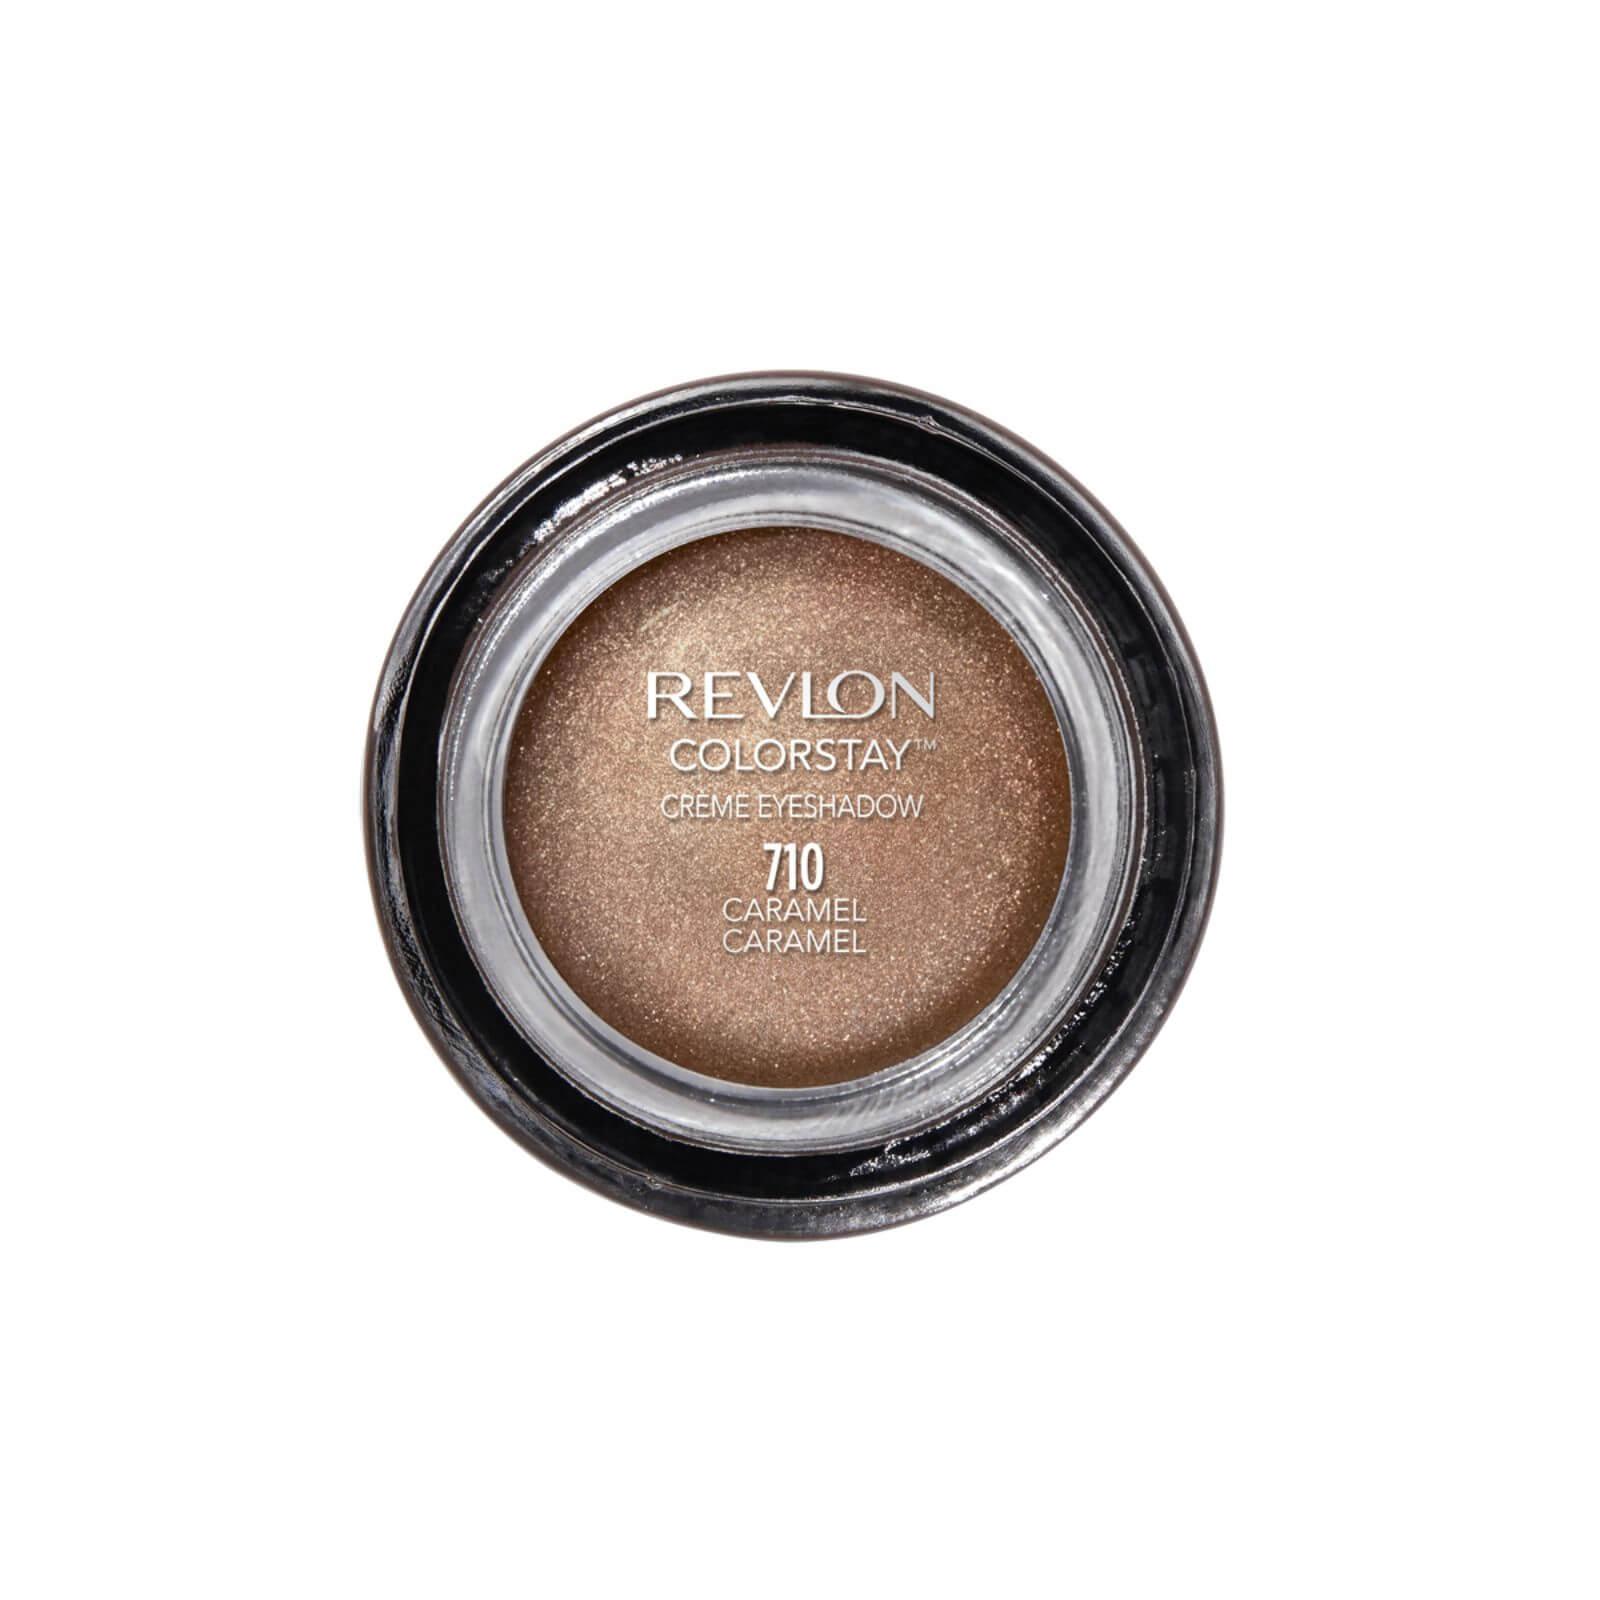 Revlon Colorstay Crème Eye Shadow (Various Shades) - Caramel